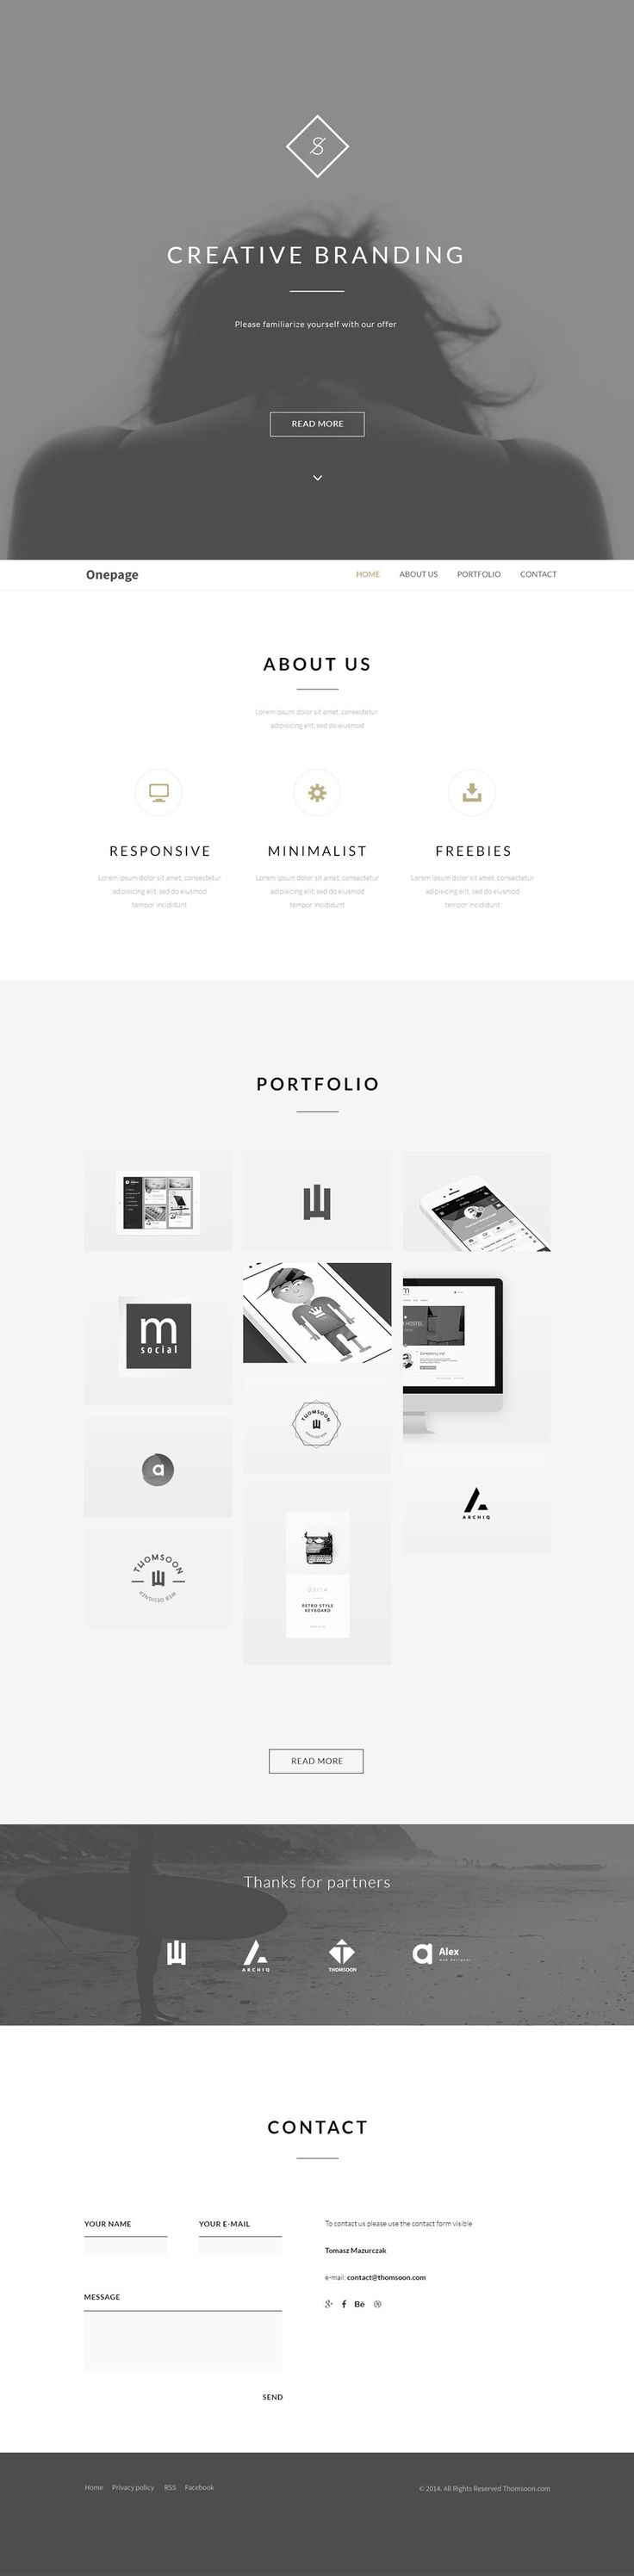 Behance One Page Portfolio